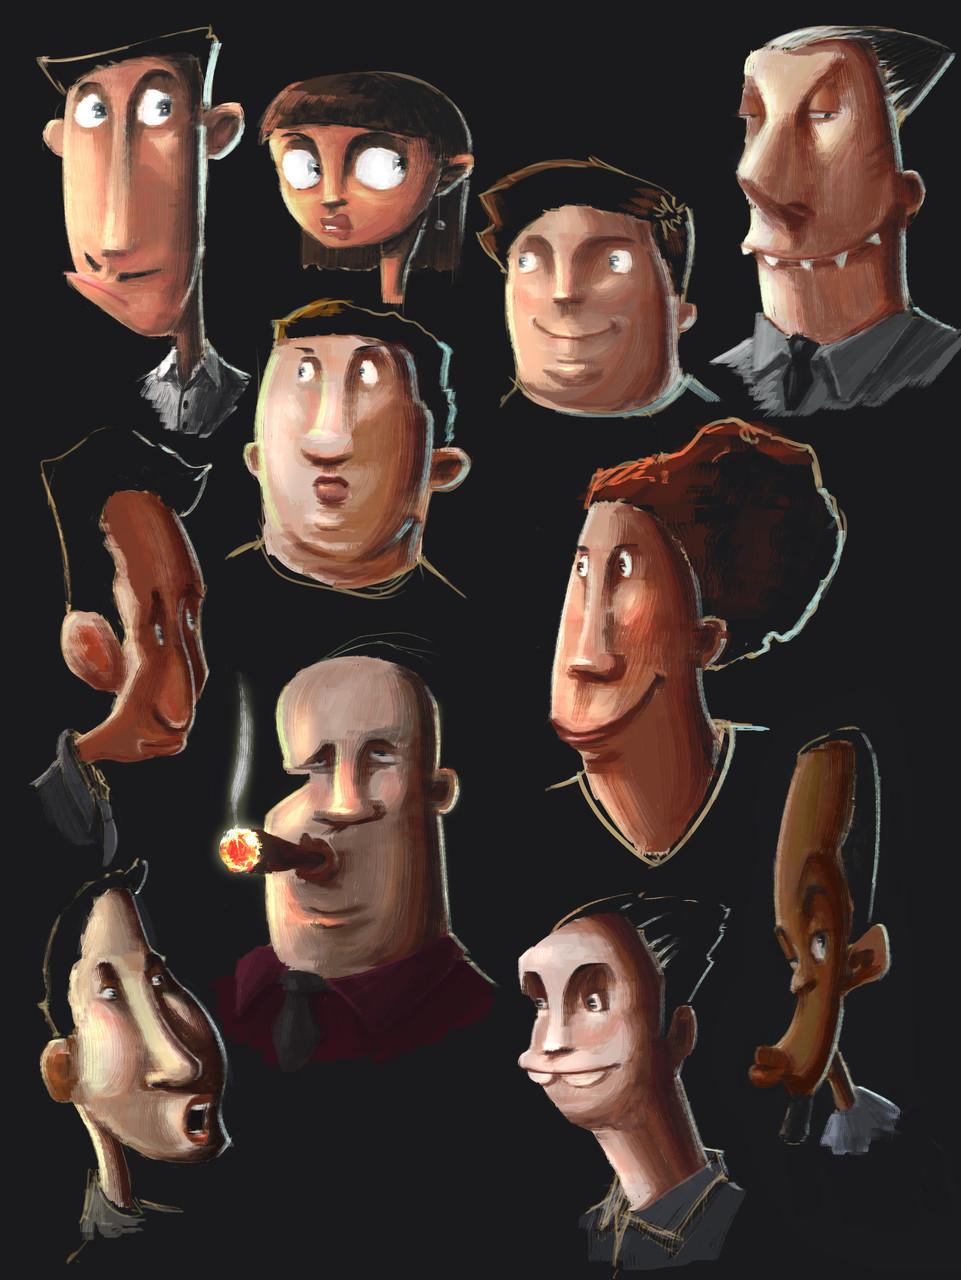 Character sheet - Peter Bartels - Illustration - Concept Art